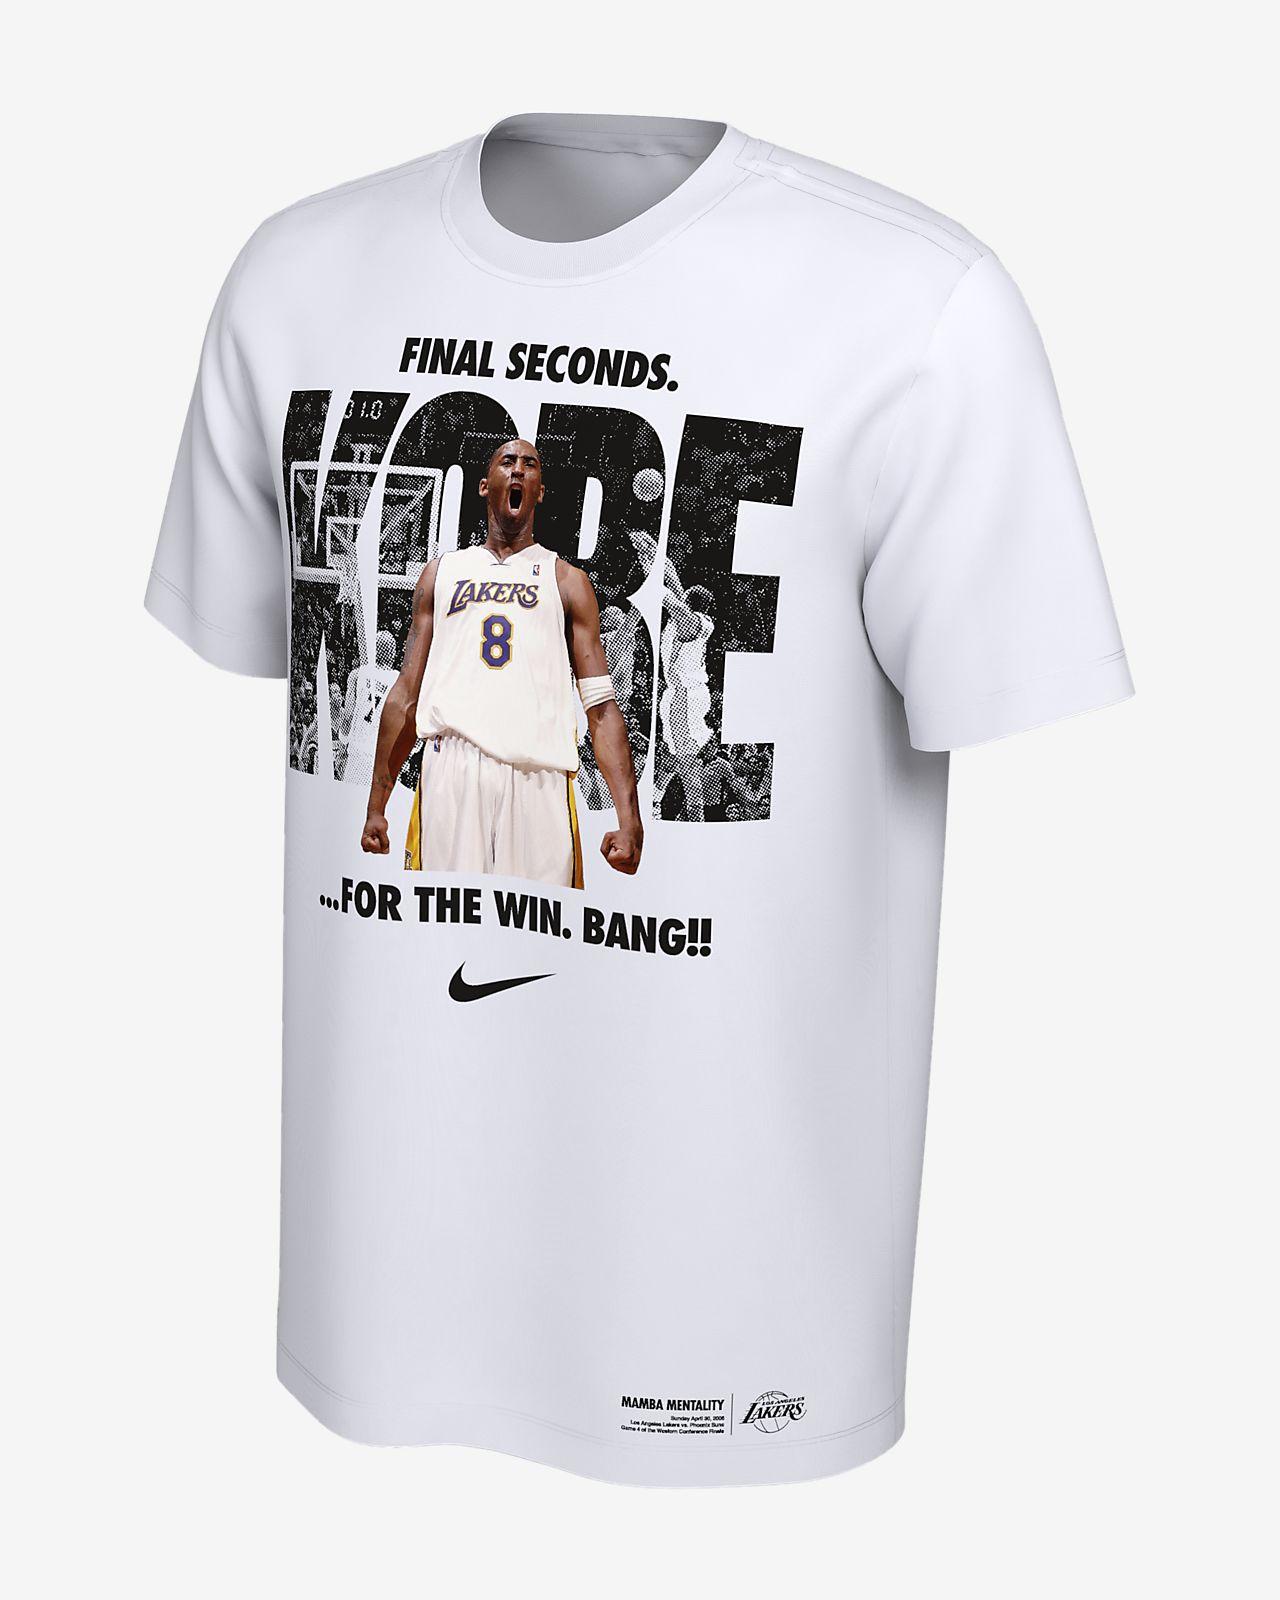 36db86b33b1d Men s NBA Graphic T-Shirt. Kobe Bryant Los Angeles Lakers Nike Dri-FIT